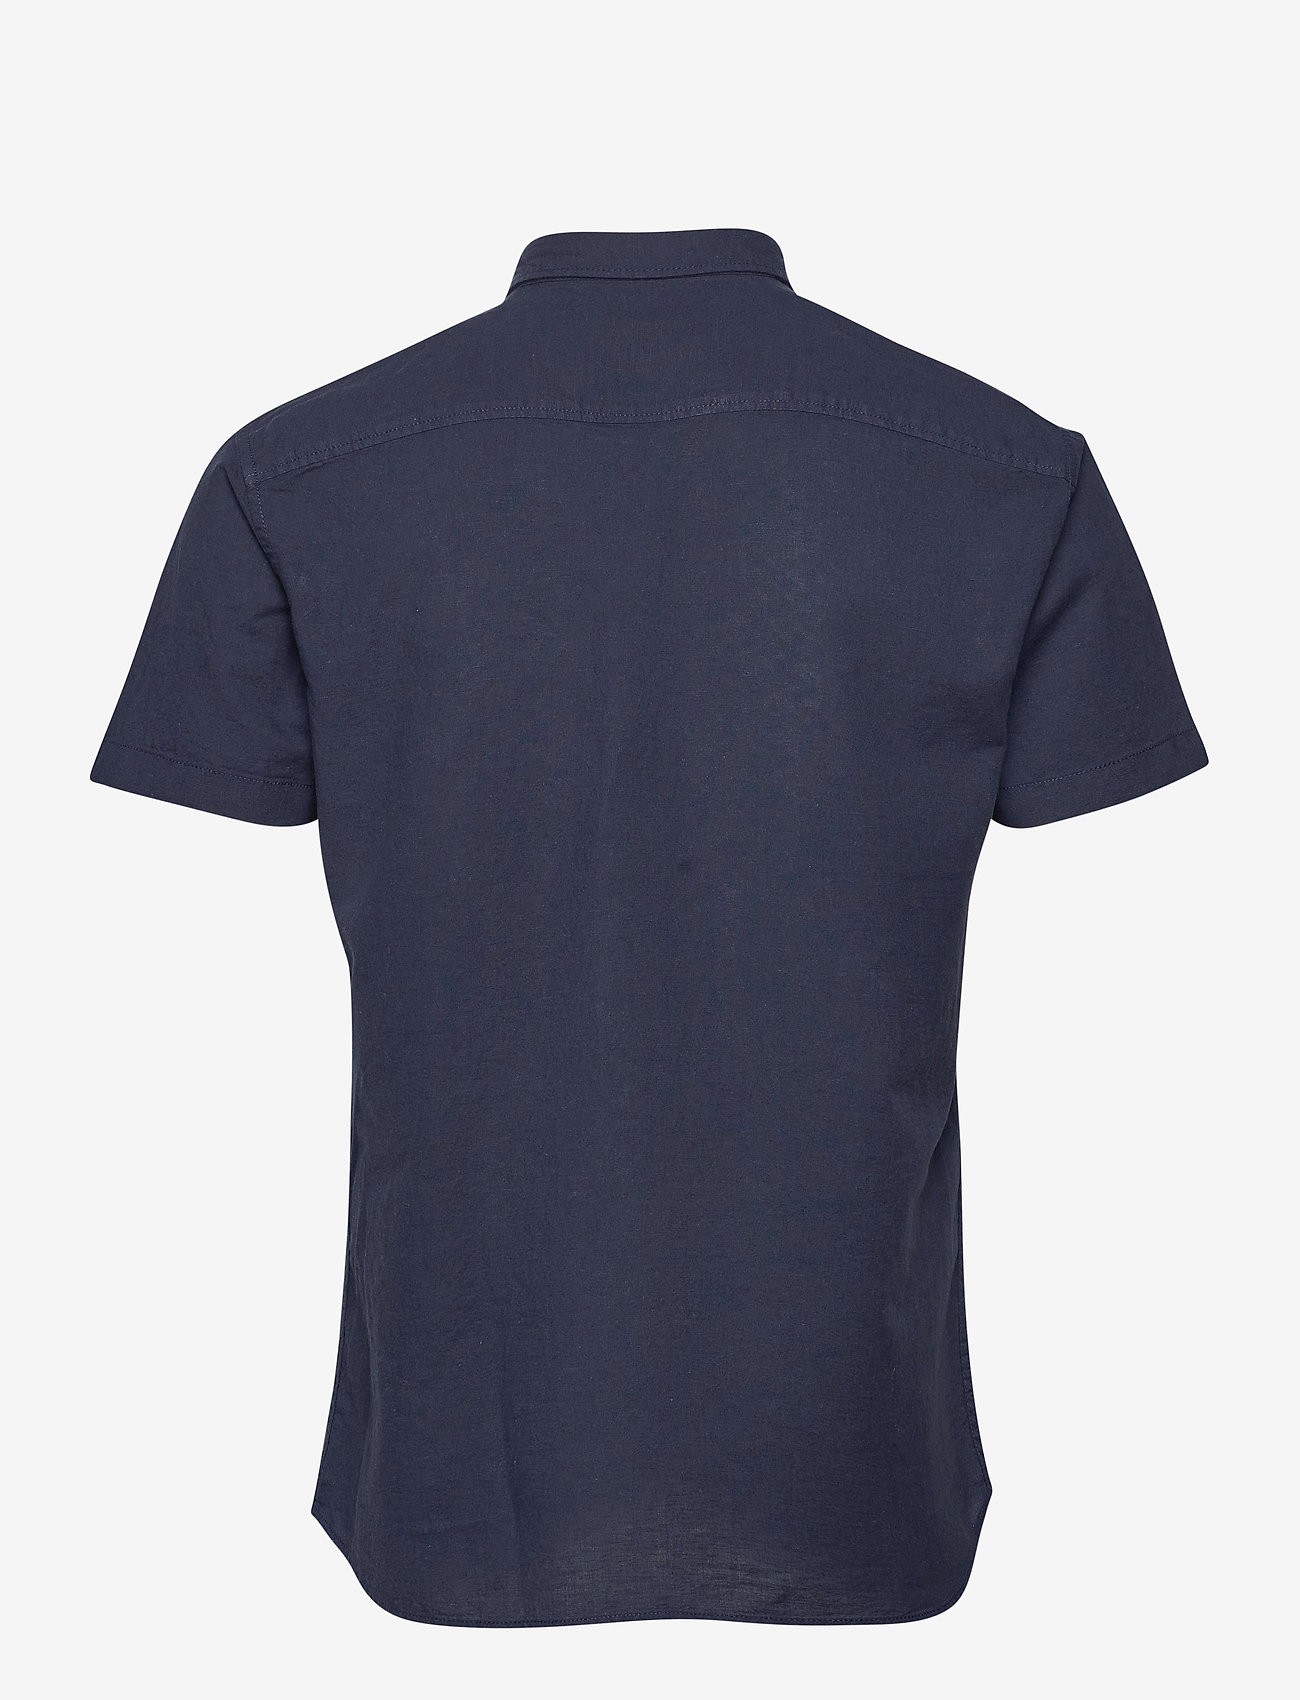 Jack & Jones - JJESUMMER SHIRT S/S S21 STS - basic skjorter - navy blazer - 1